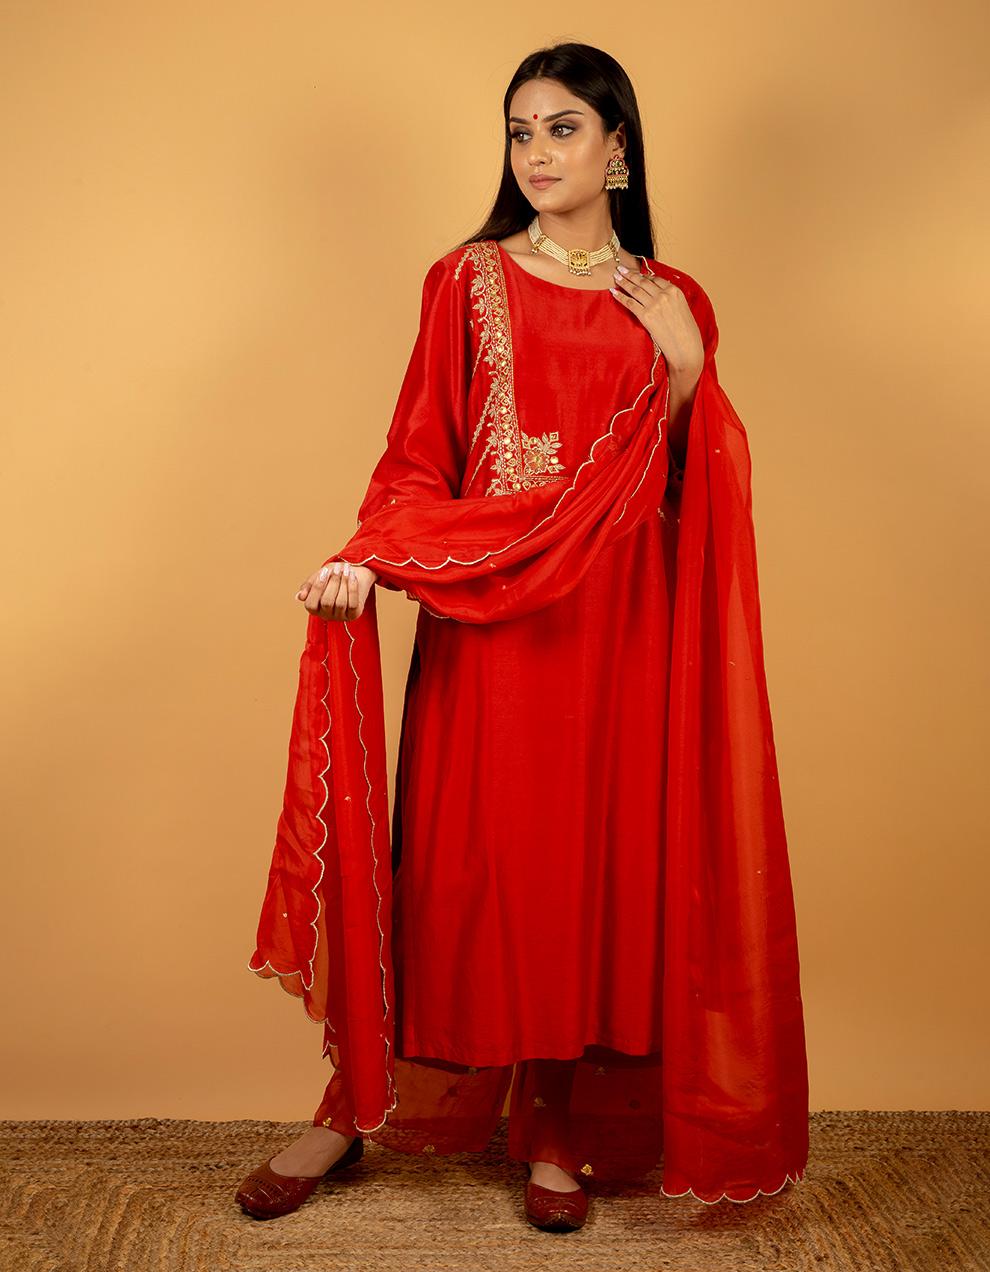 Chanderi silk dupatta designs in India.